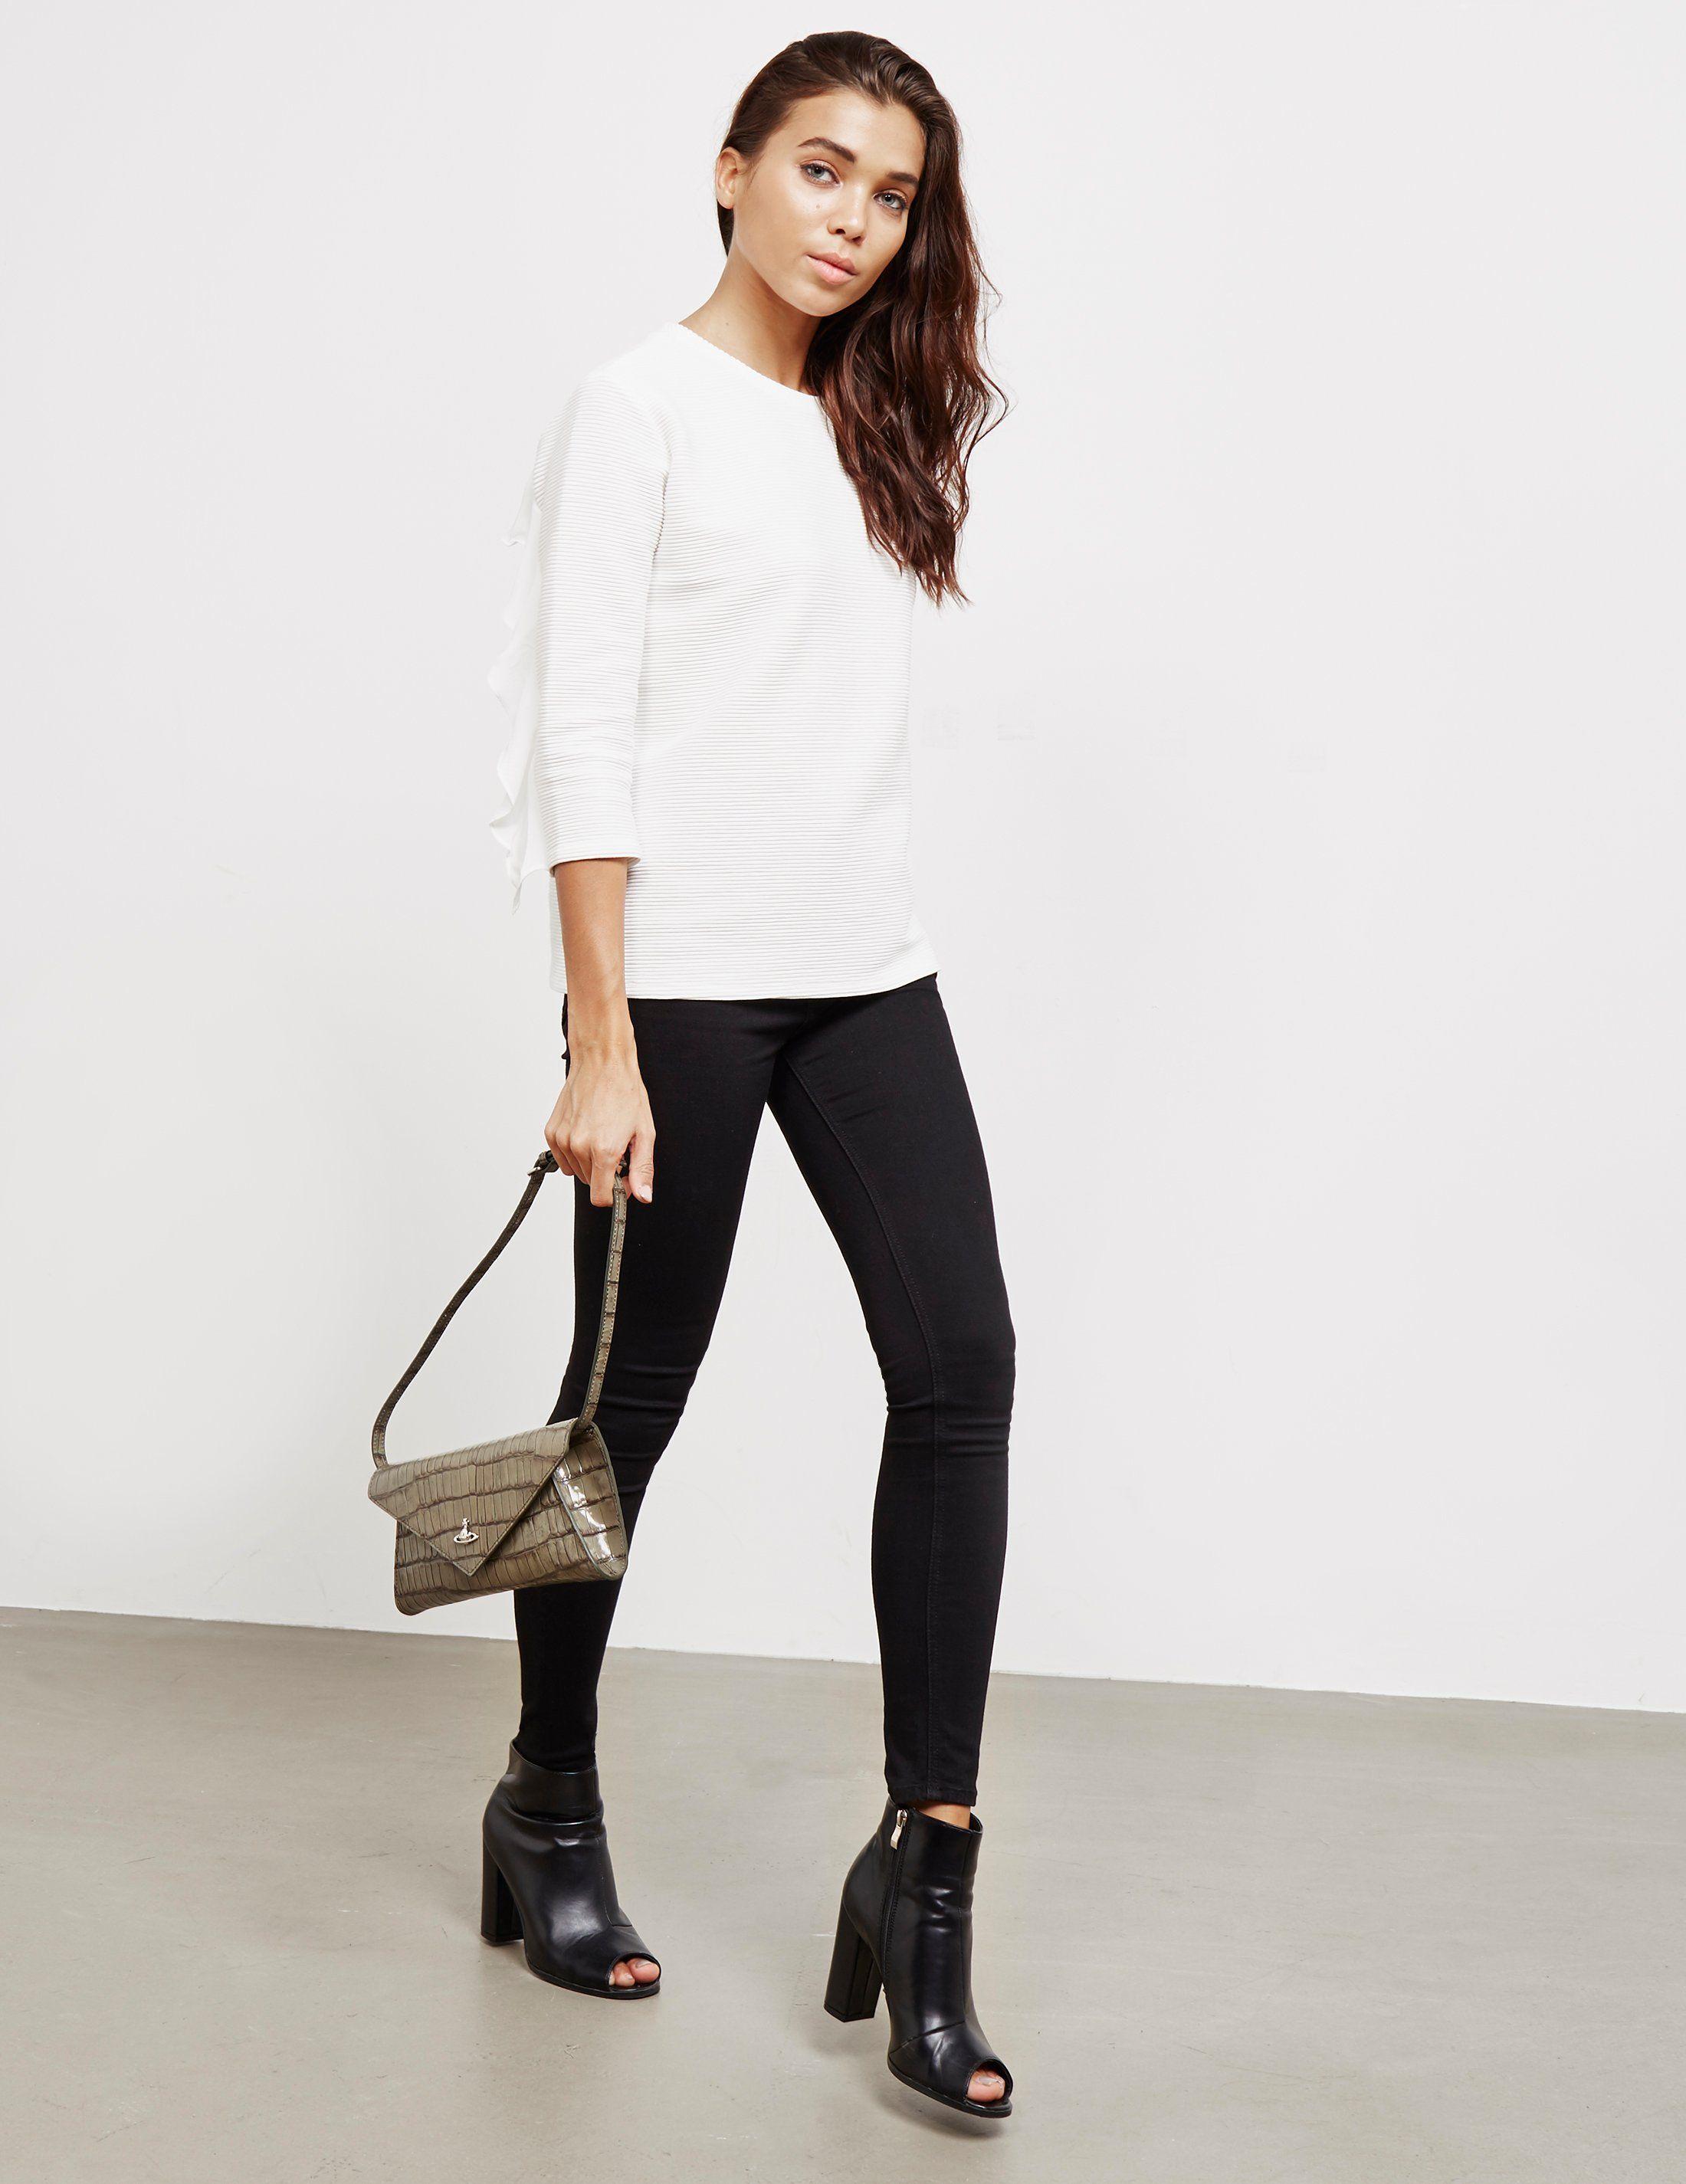 Vivienne Westwood Lisa Croc Envelope Clutch Bag - Online Exclusive